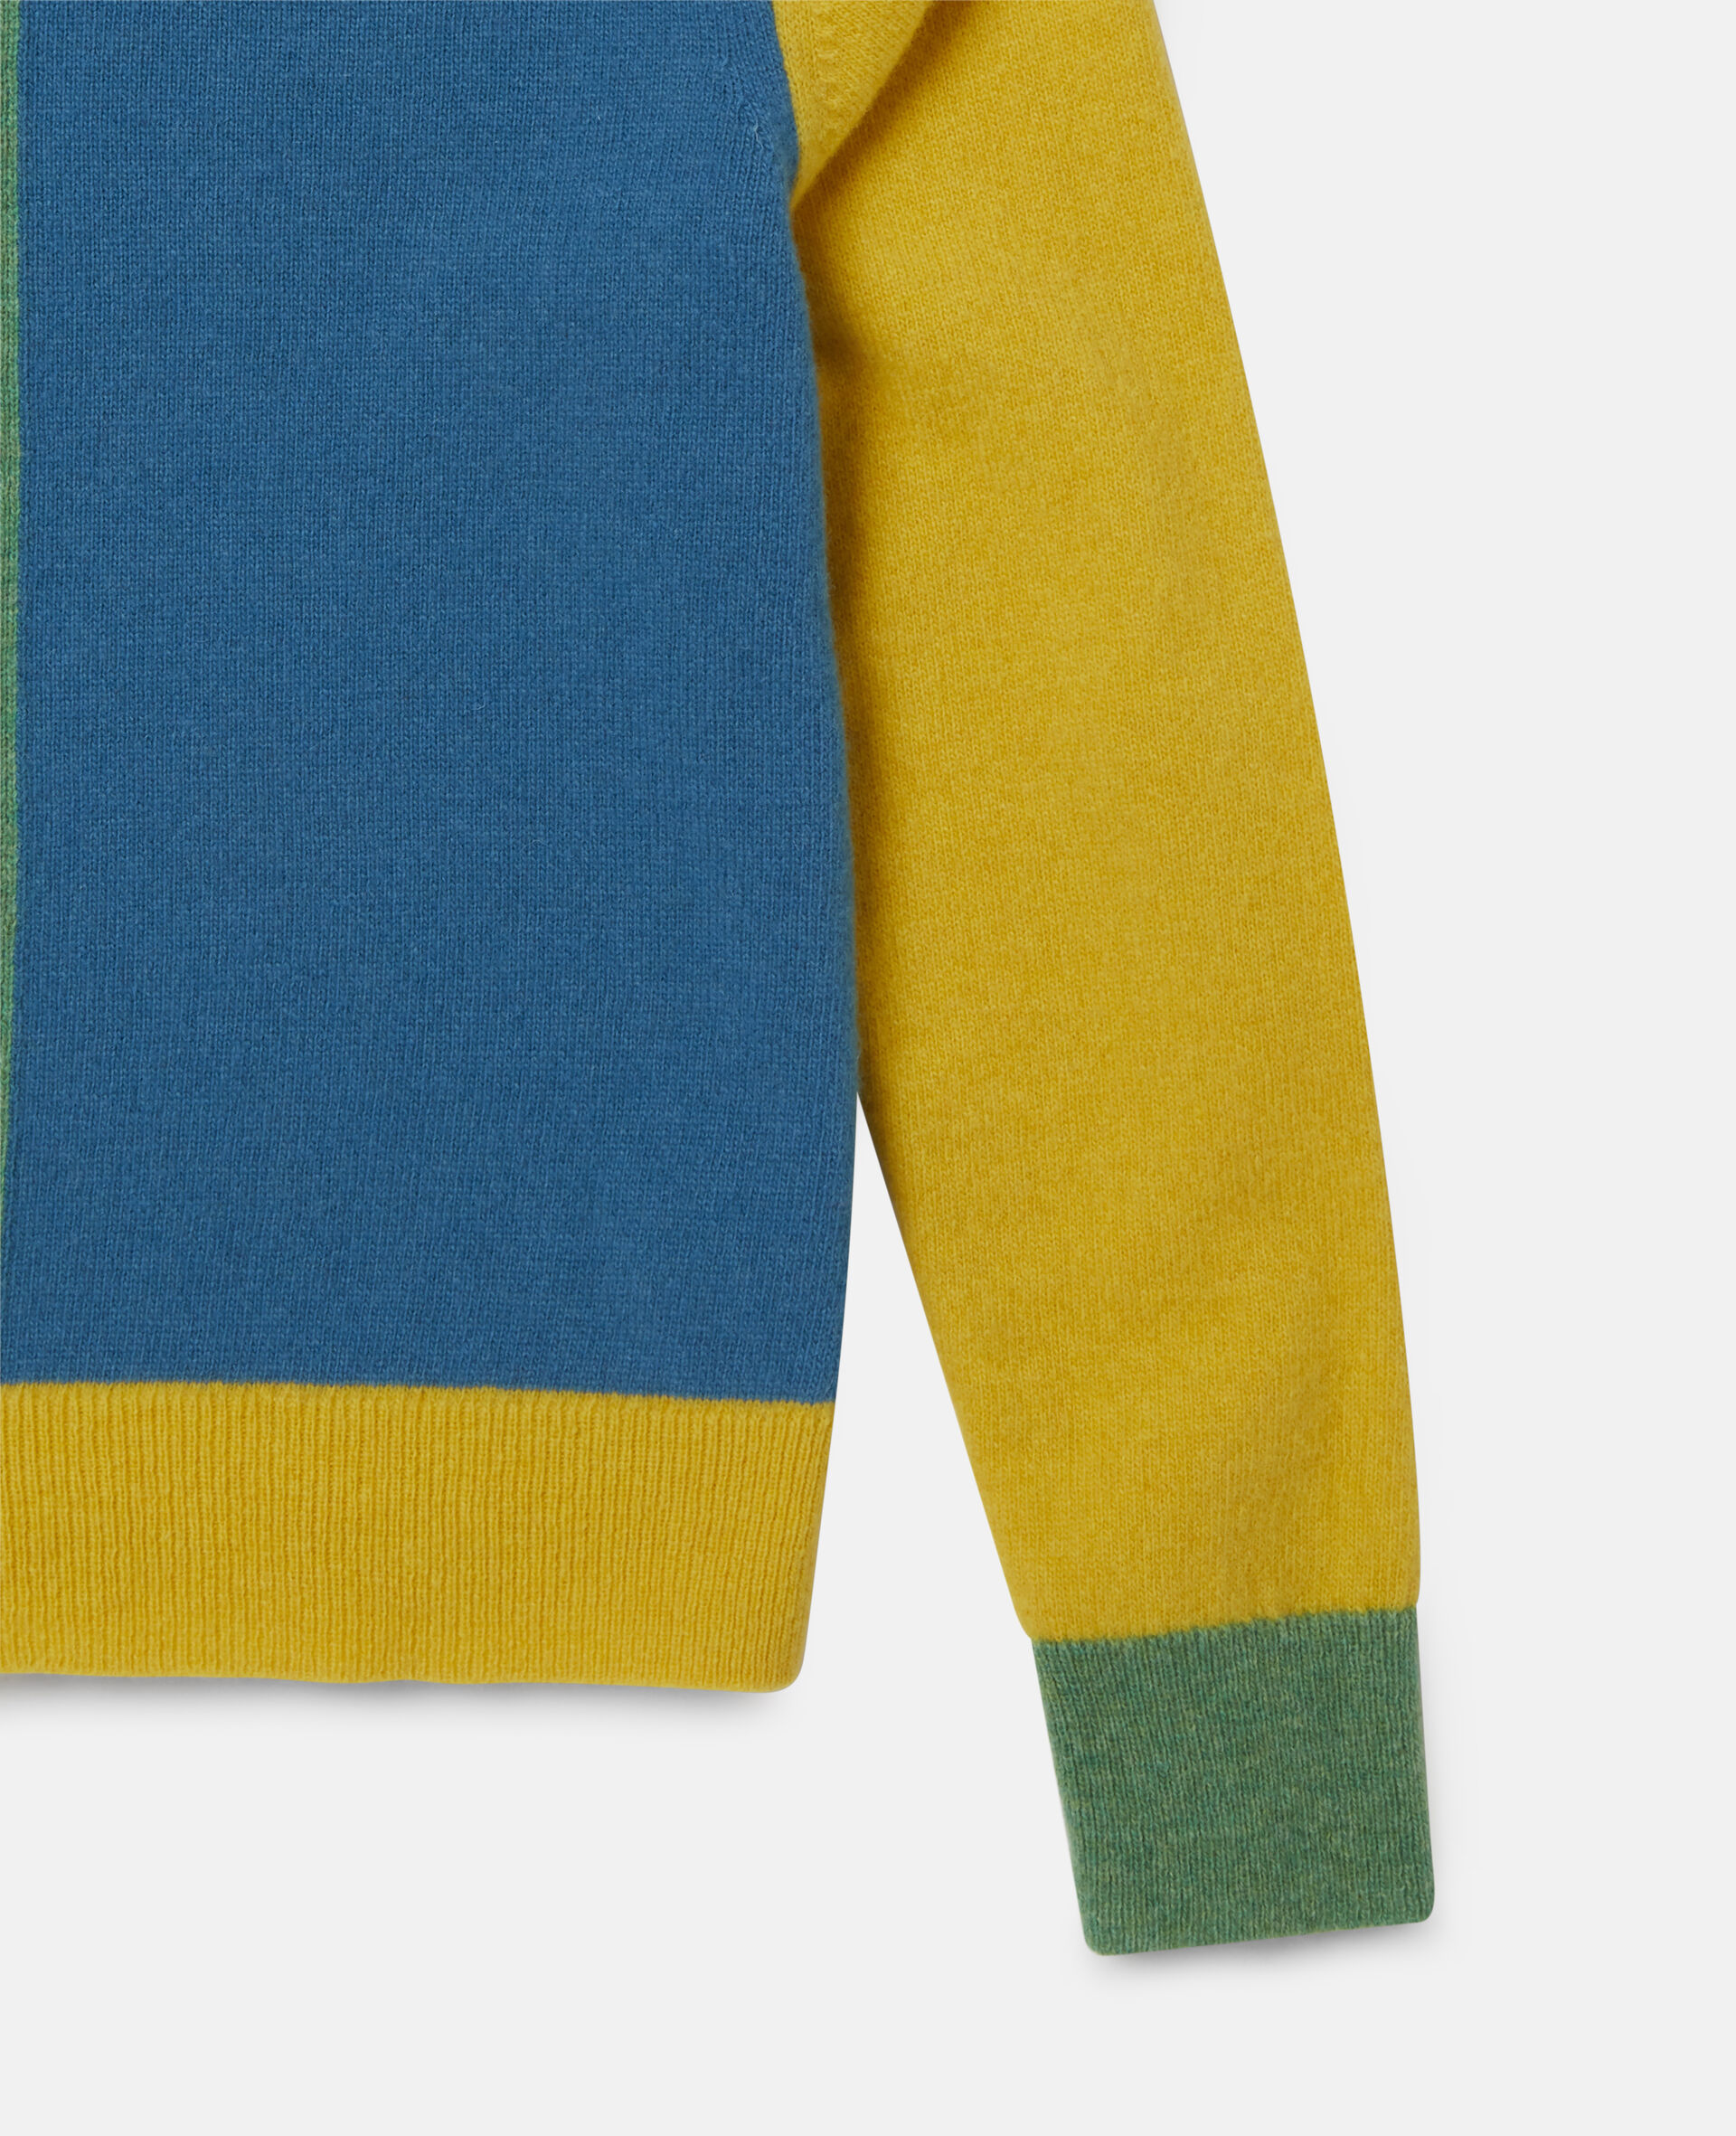 Strickpullover in Blockfarben-Design mit Intarsienmuster -Bunt-large image number 2